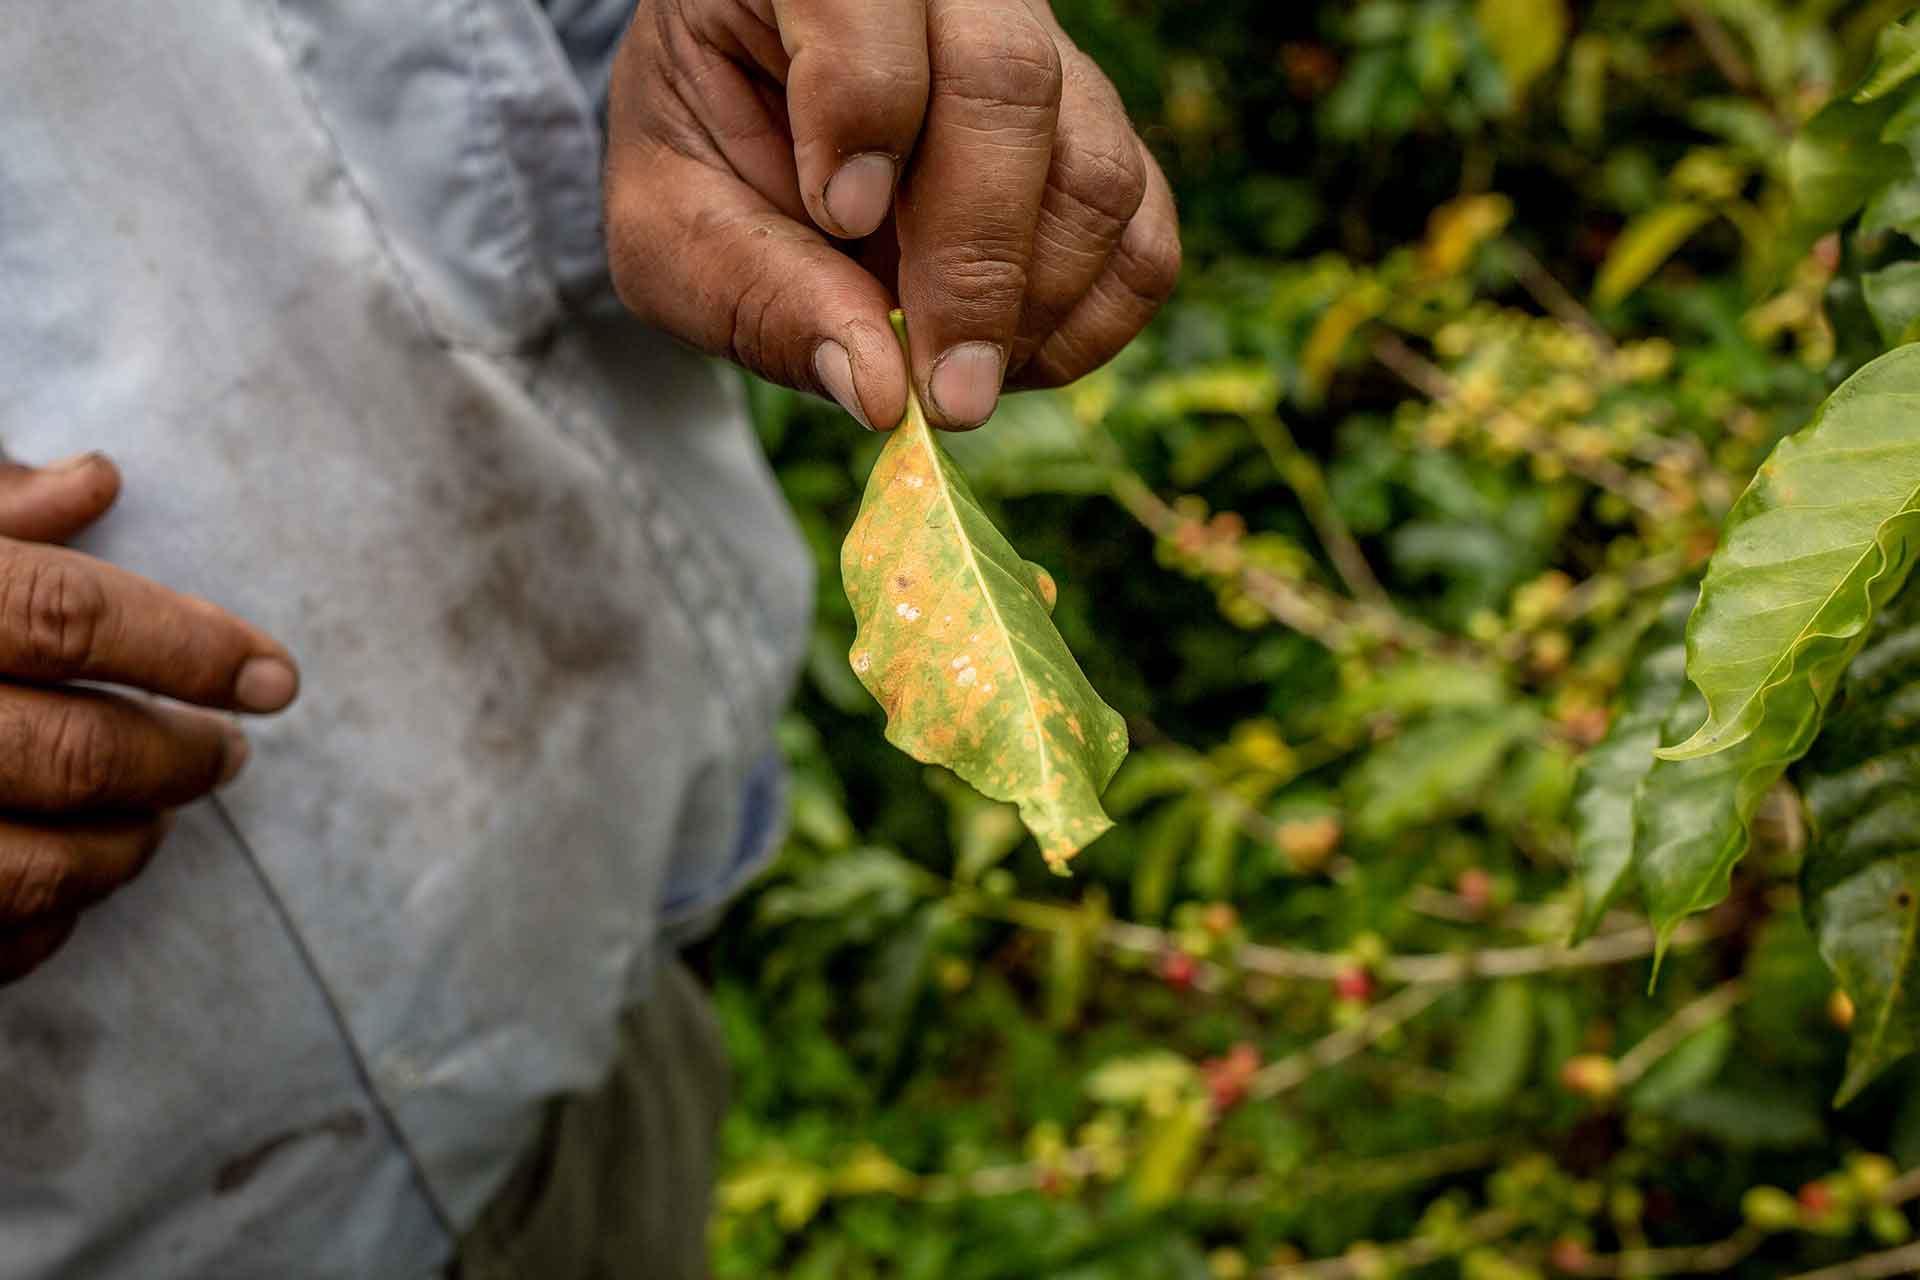 Kaffee und der Klimawandel. CafCaf – Kaffee & Blog, Kaffeeblog